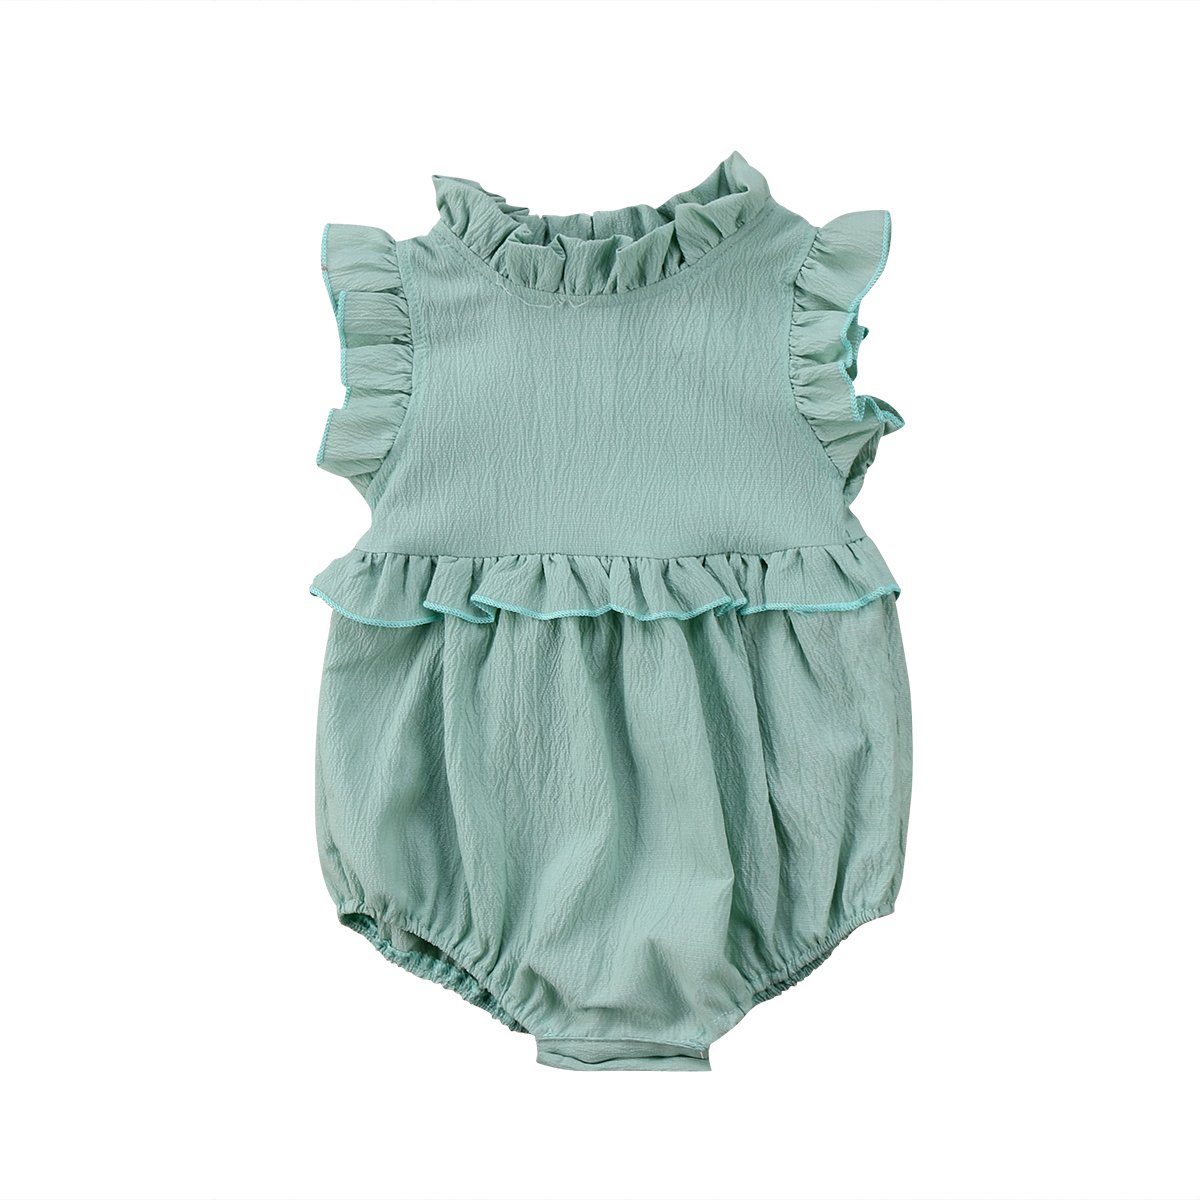 где купить Newborn Baby Girls Sleeveless Ruffles Romper Jumpsuit Clothes Outfits Summer по лучшей цене